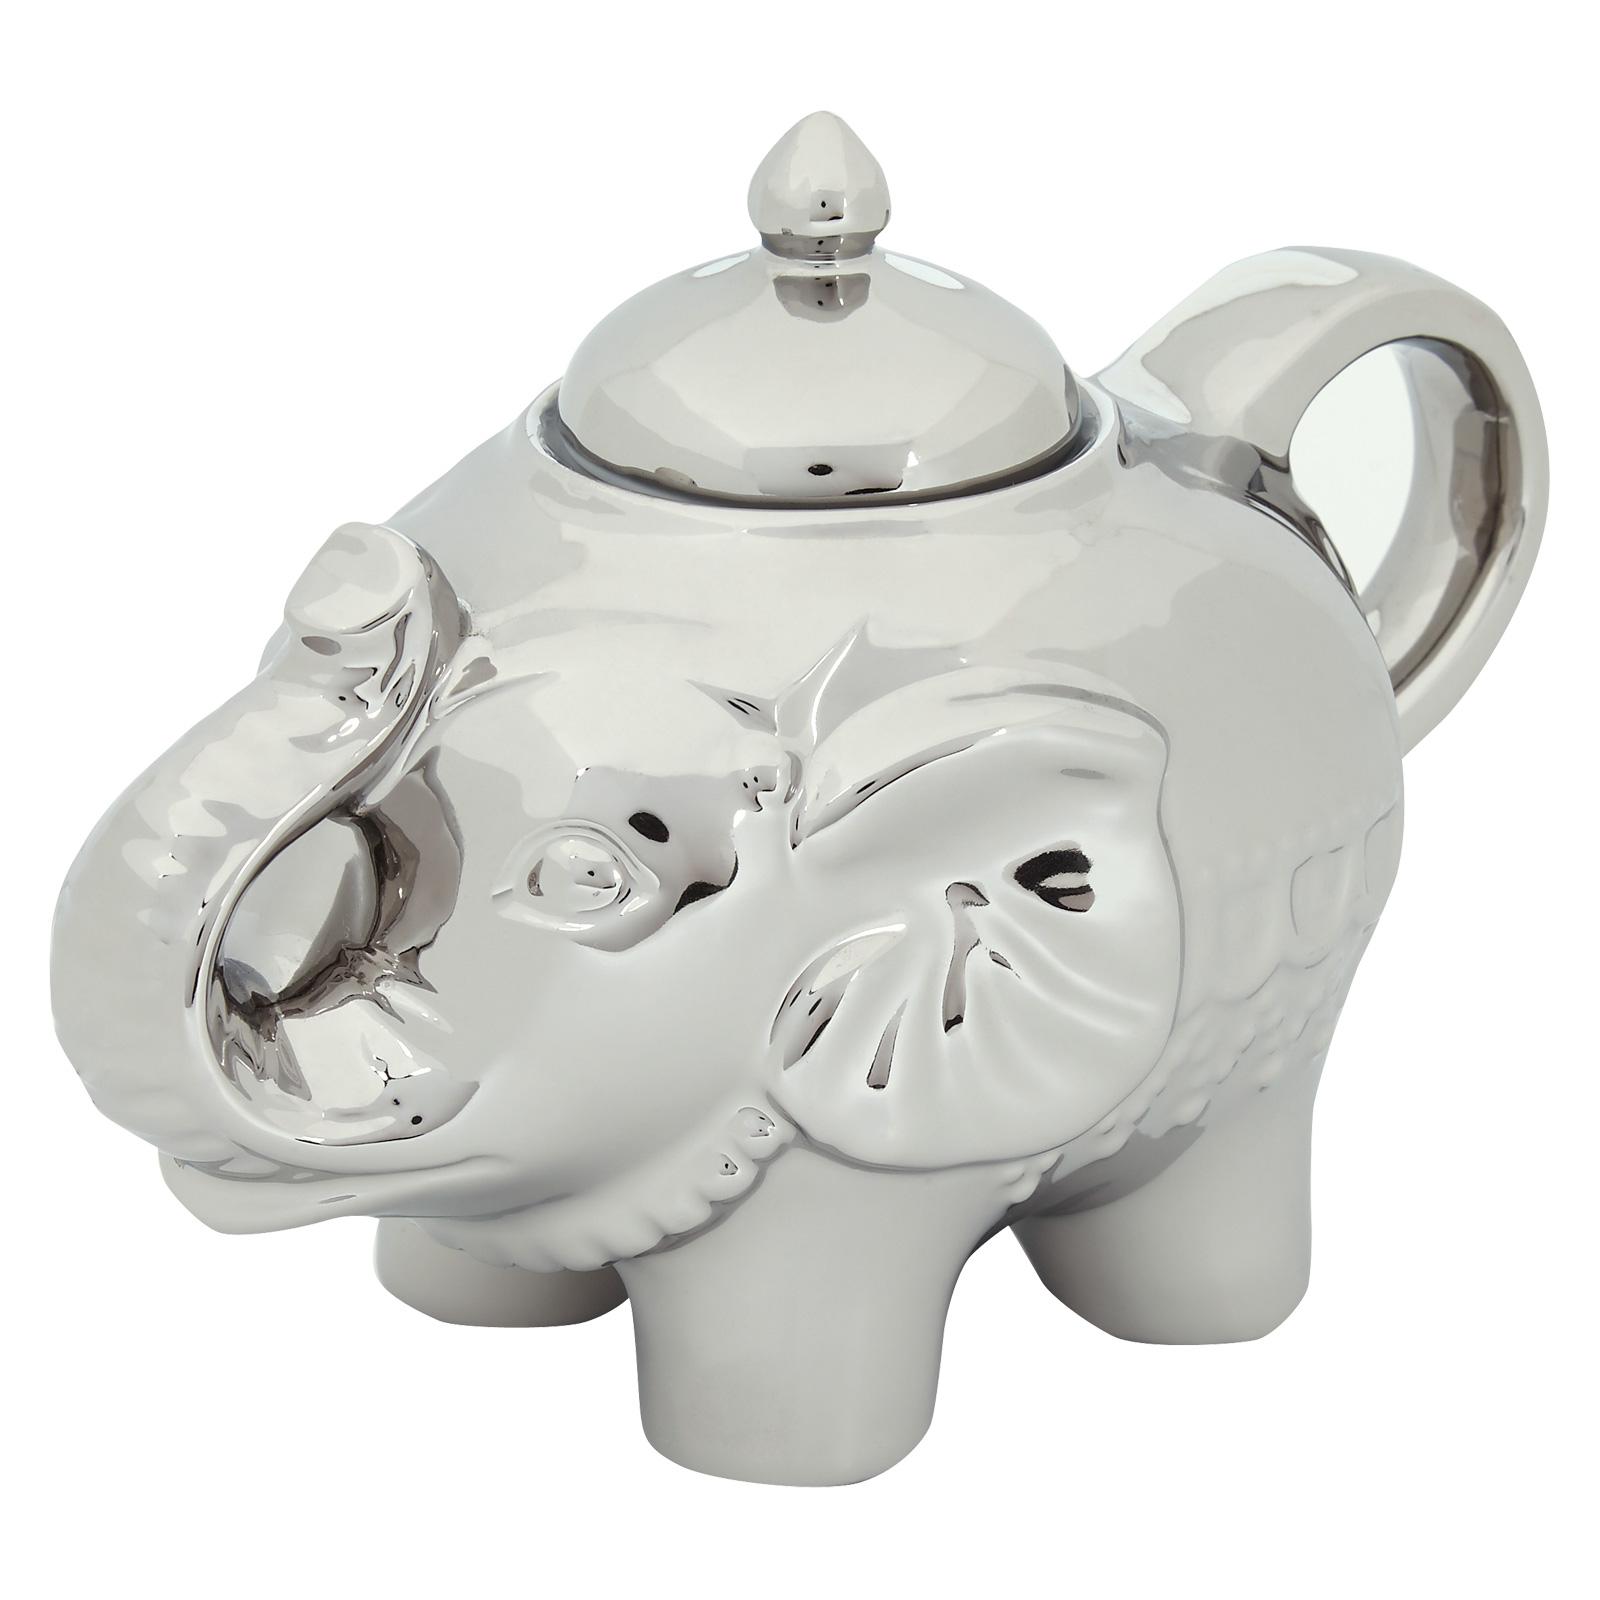 Elephant Sugar Pot Platinum by BIA